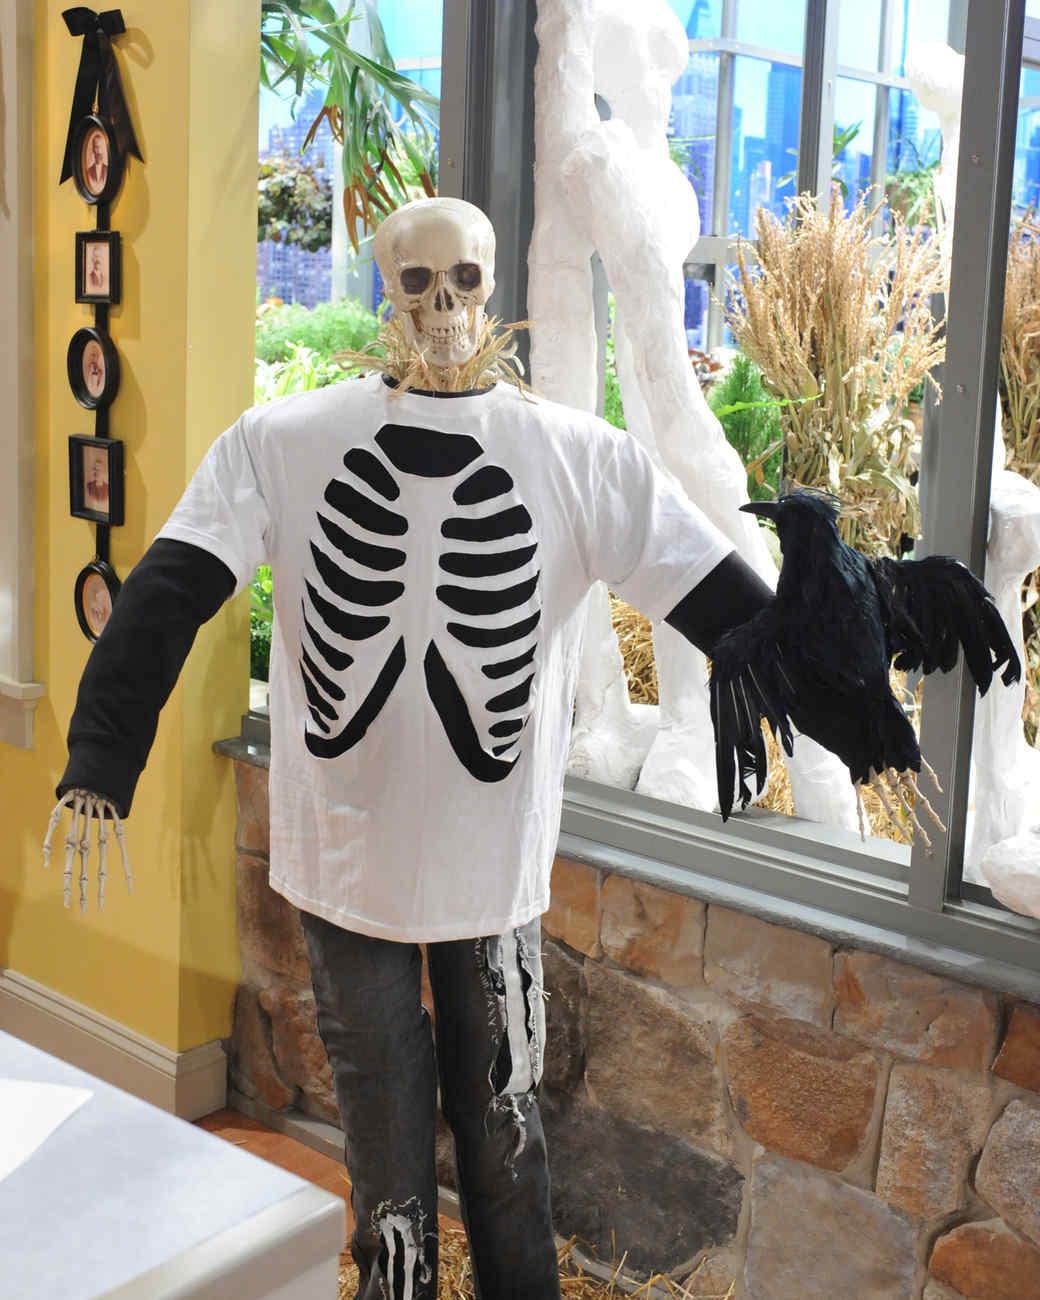 graphic regarding Skeleton Costume Template Printable titled Rib Cage T-Blouse Movie Martha Stewart